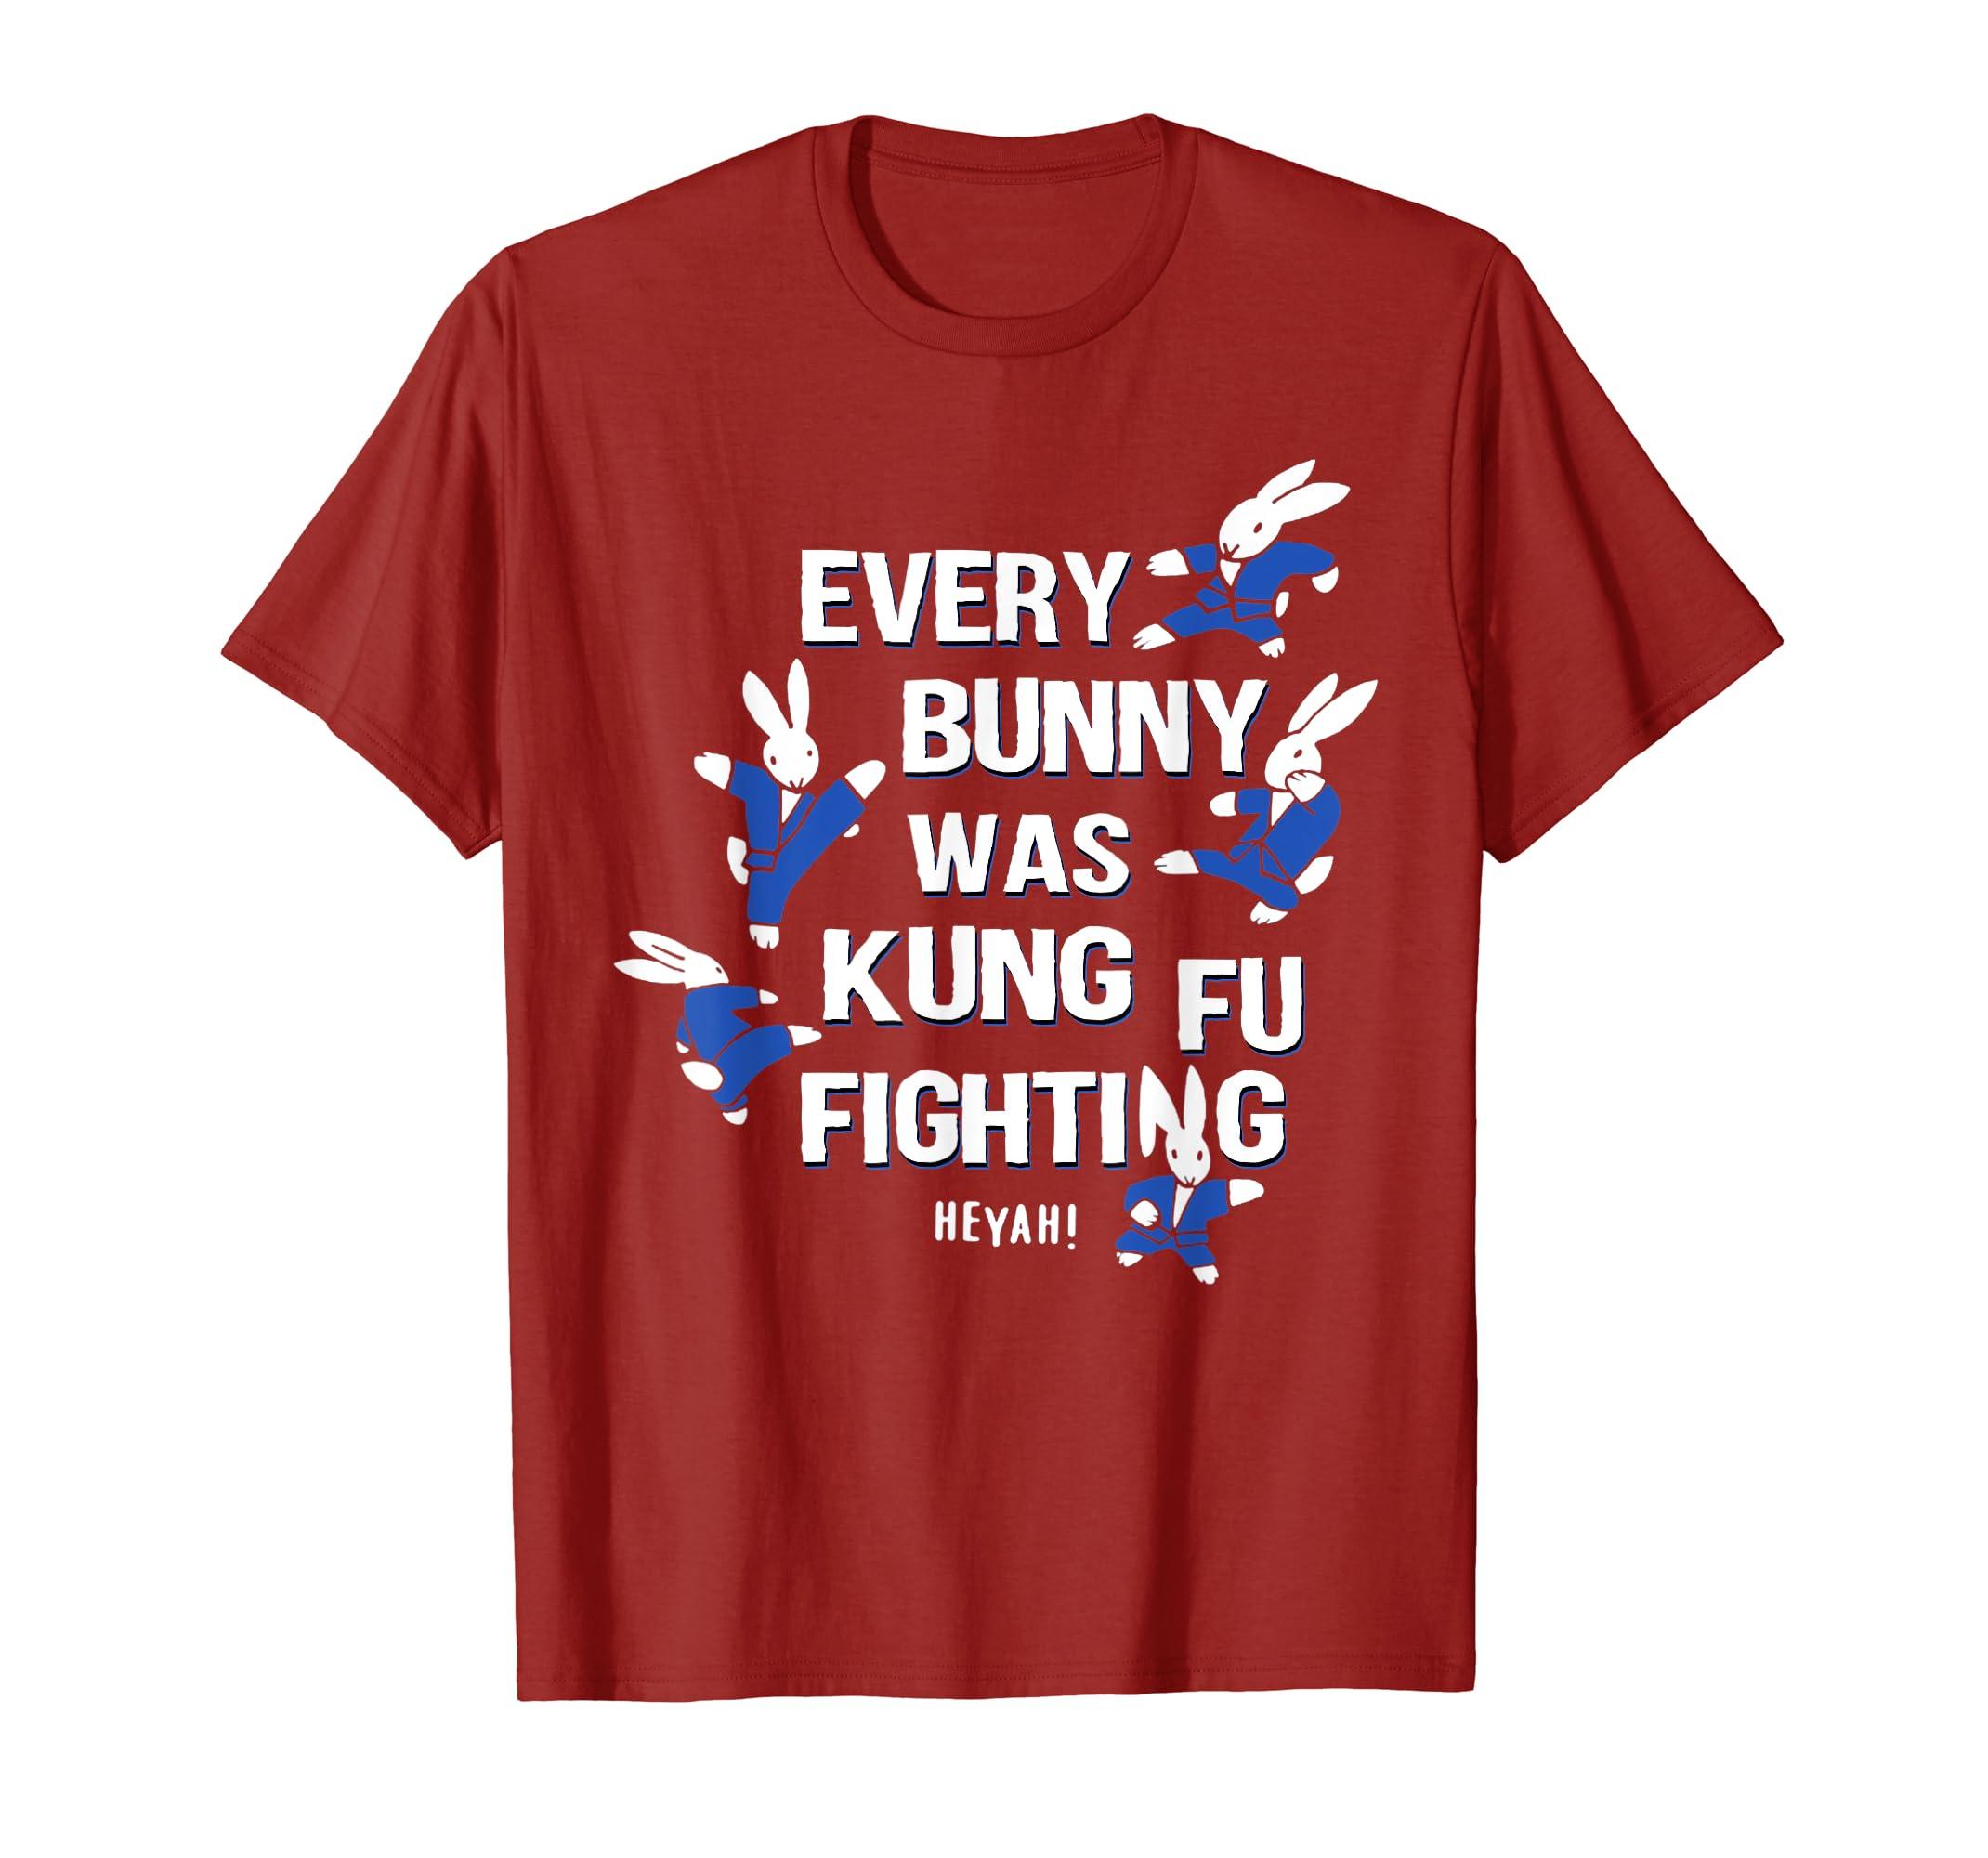 EVERY BUNNY WAS KUNG FU FIGHTING T-SHIRT-Yolotee